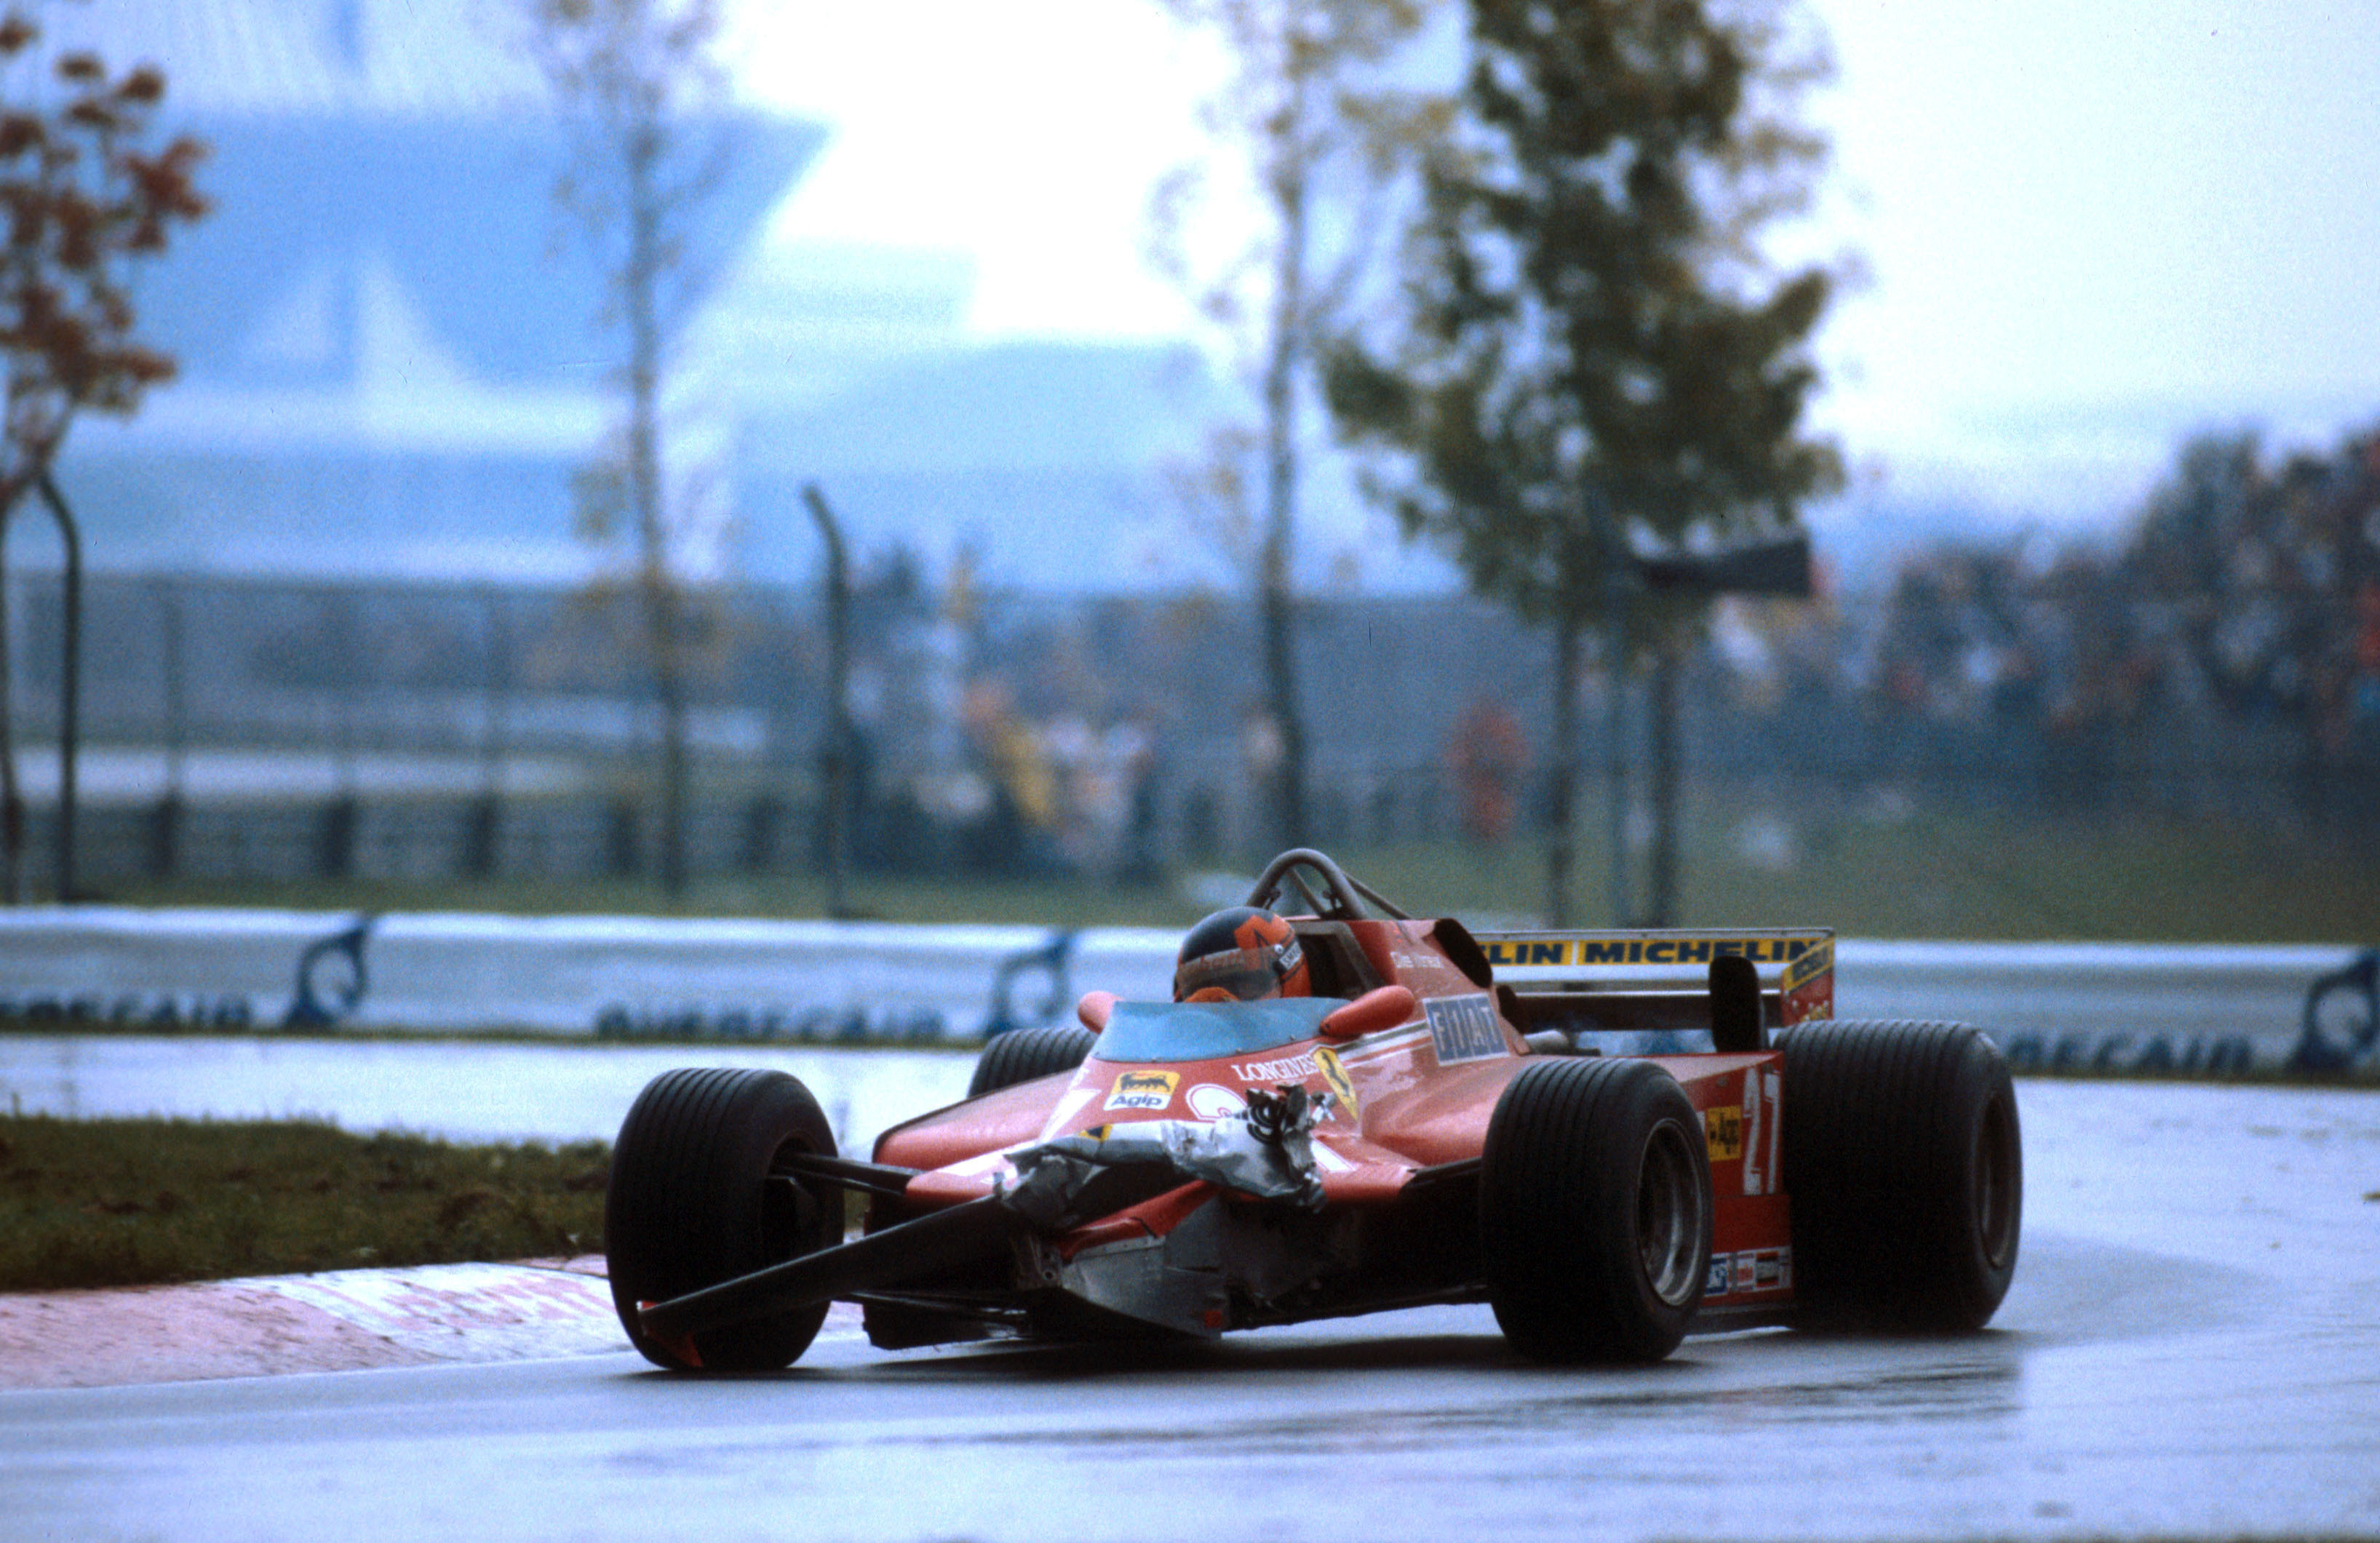 Gilles Villeneuve Ferrari damage Canadian Grand Prix 1981 Montreal